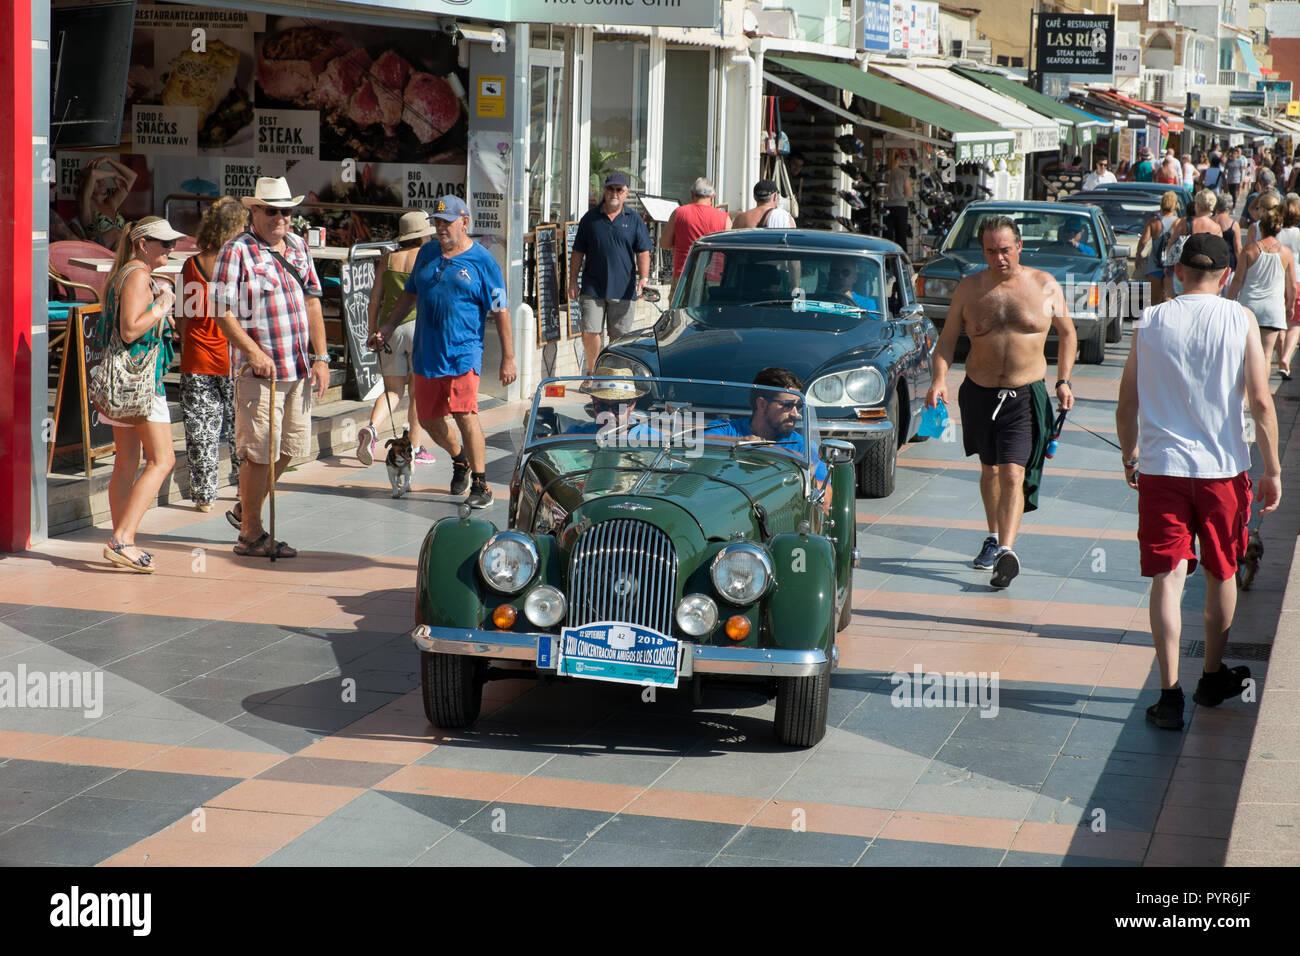 Morgan. Reunión de coches clásicos en Torremolinos, Málaga, España. Foto de stock